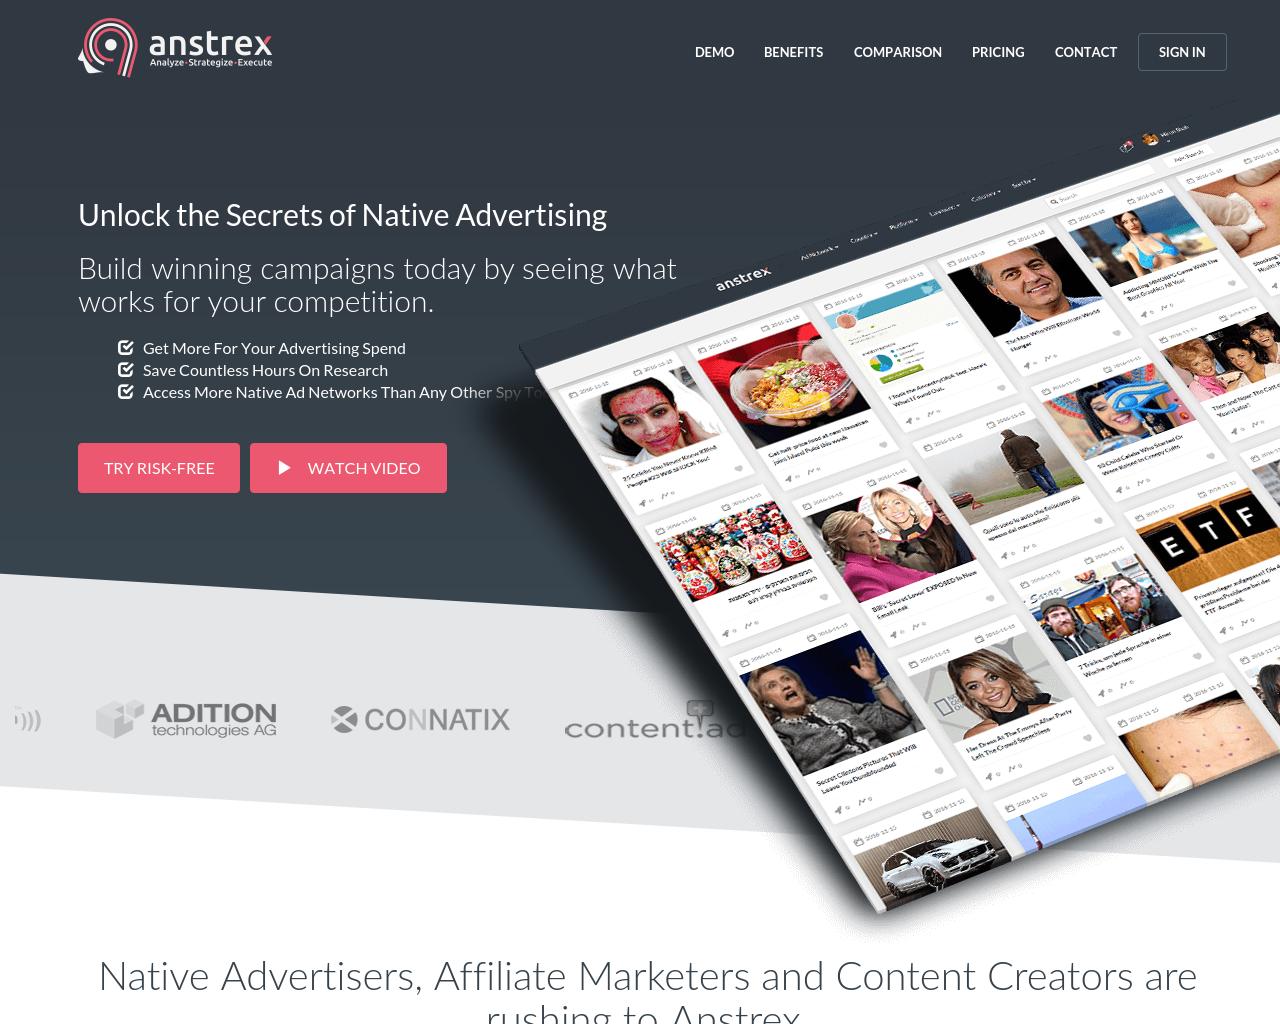 Anstrex-Advertising-Reviews-Pricing